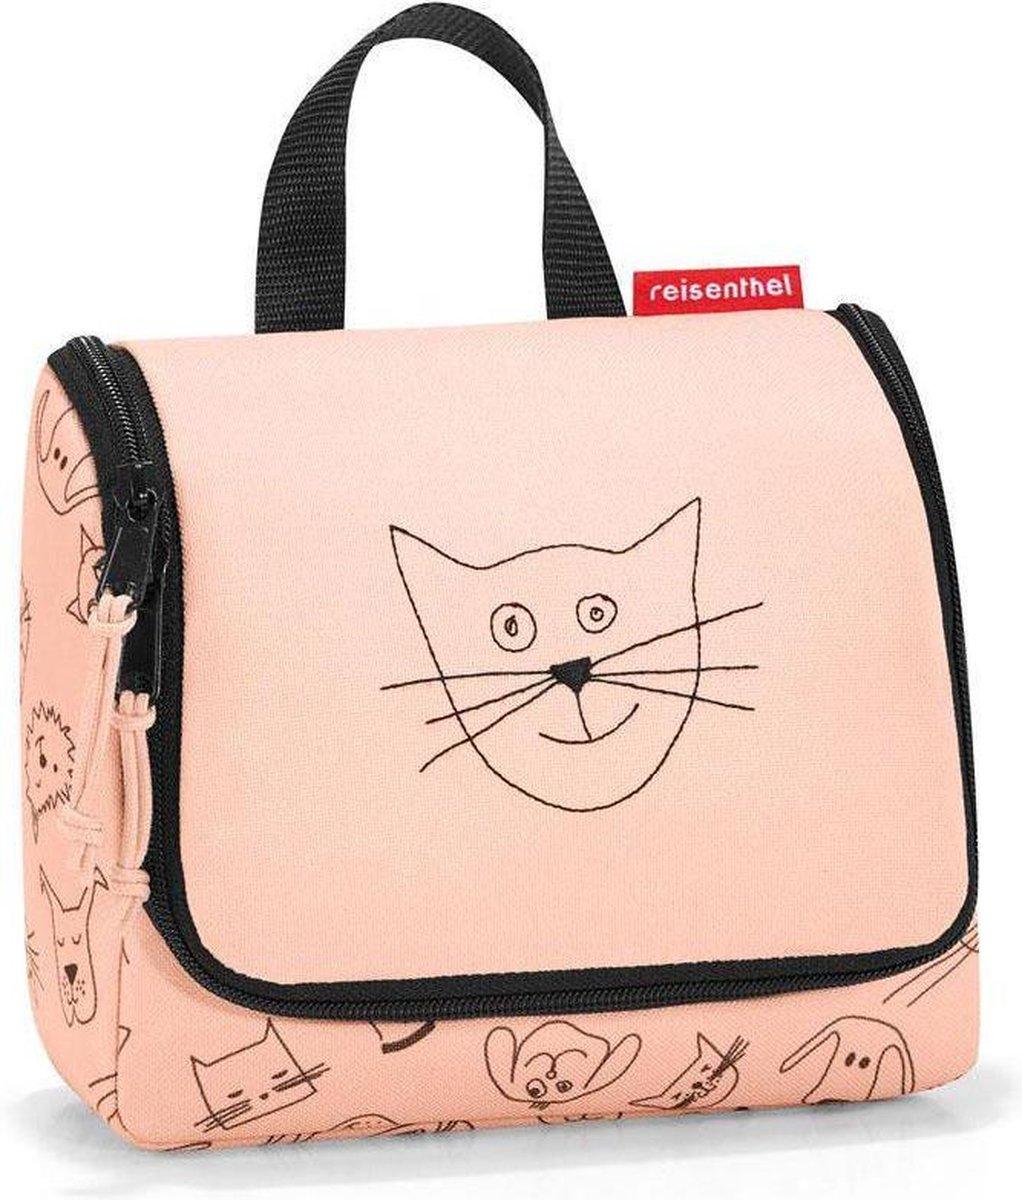 Reisenthel Toiletbag S Kids Toilettas 1.5L - Cats&Dogs Rose